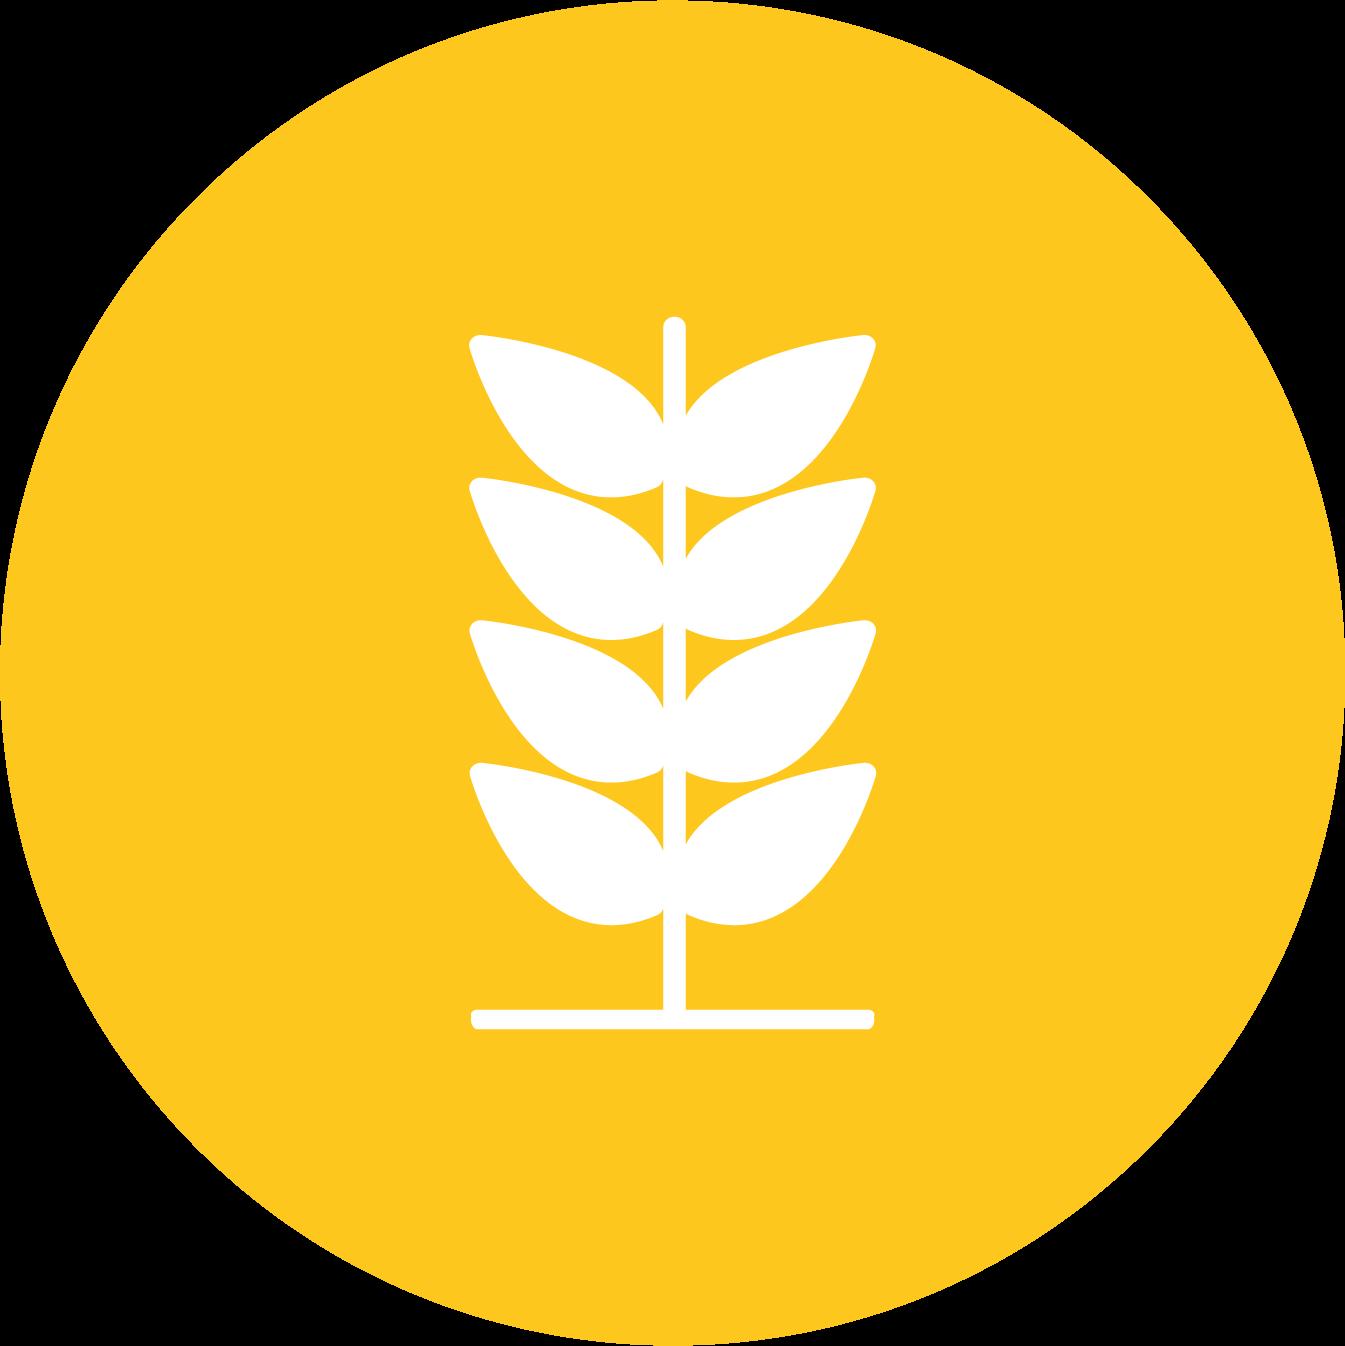 icone agricole